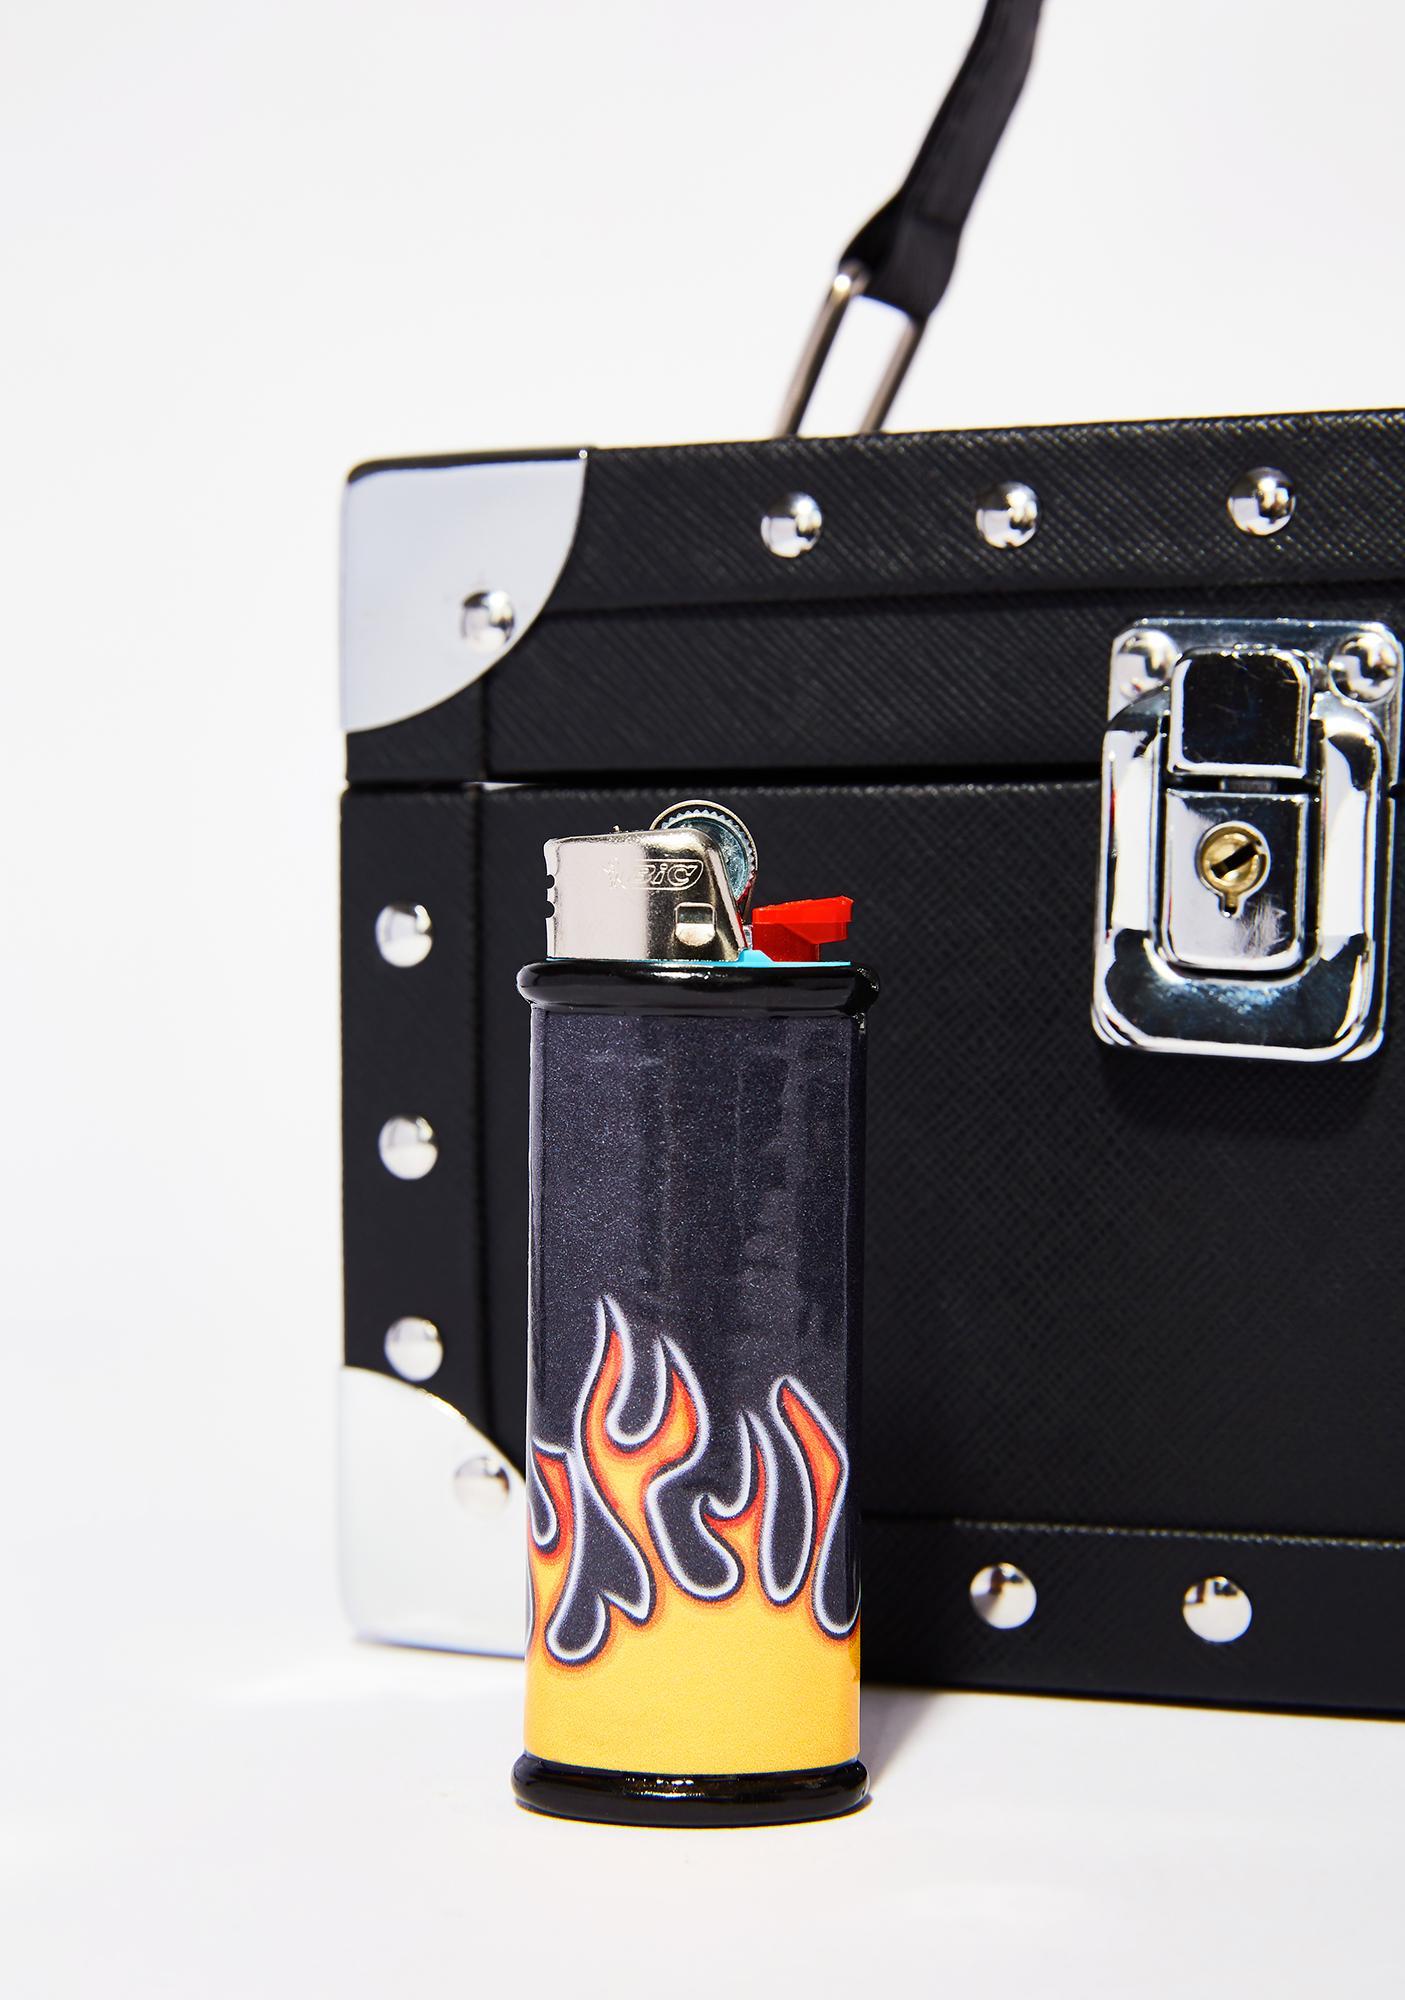 My Bubblegum Fantasy Flame Lighter Case